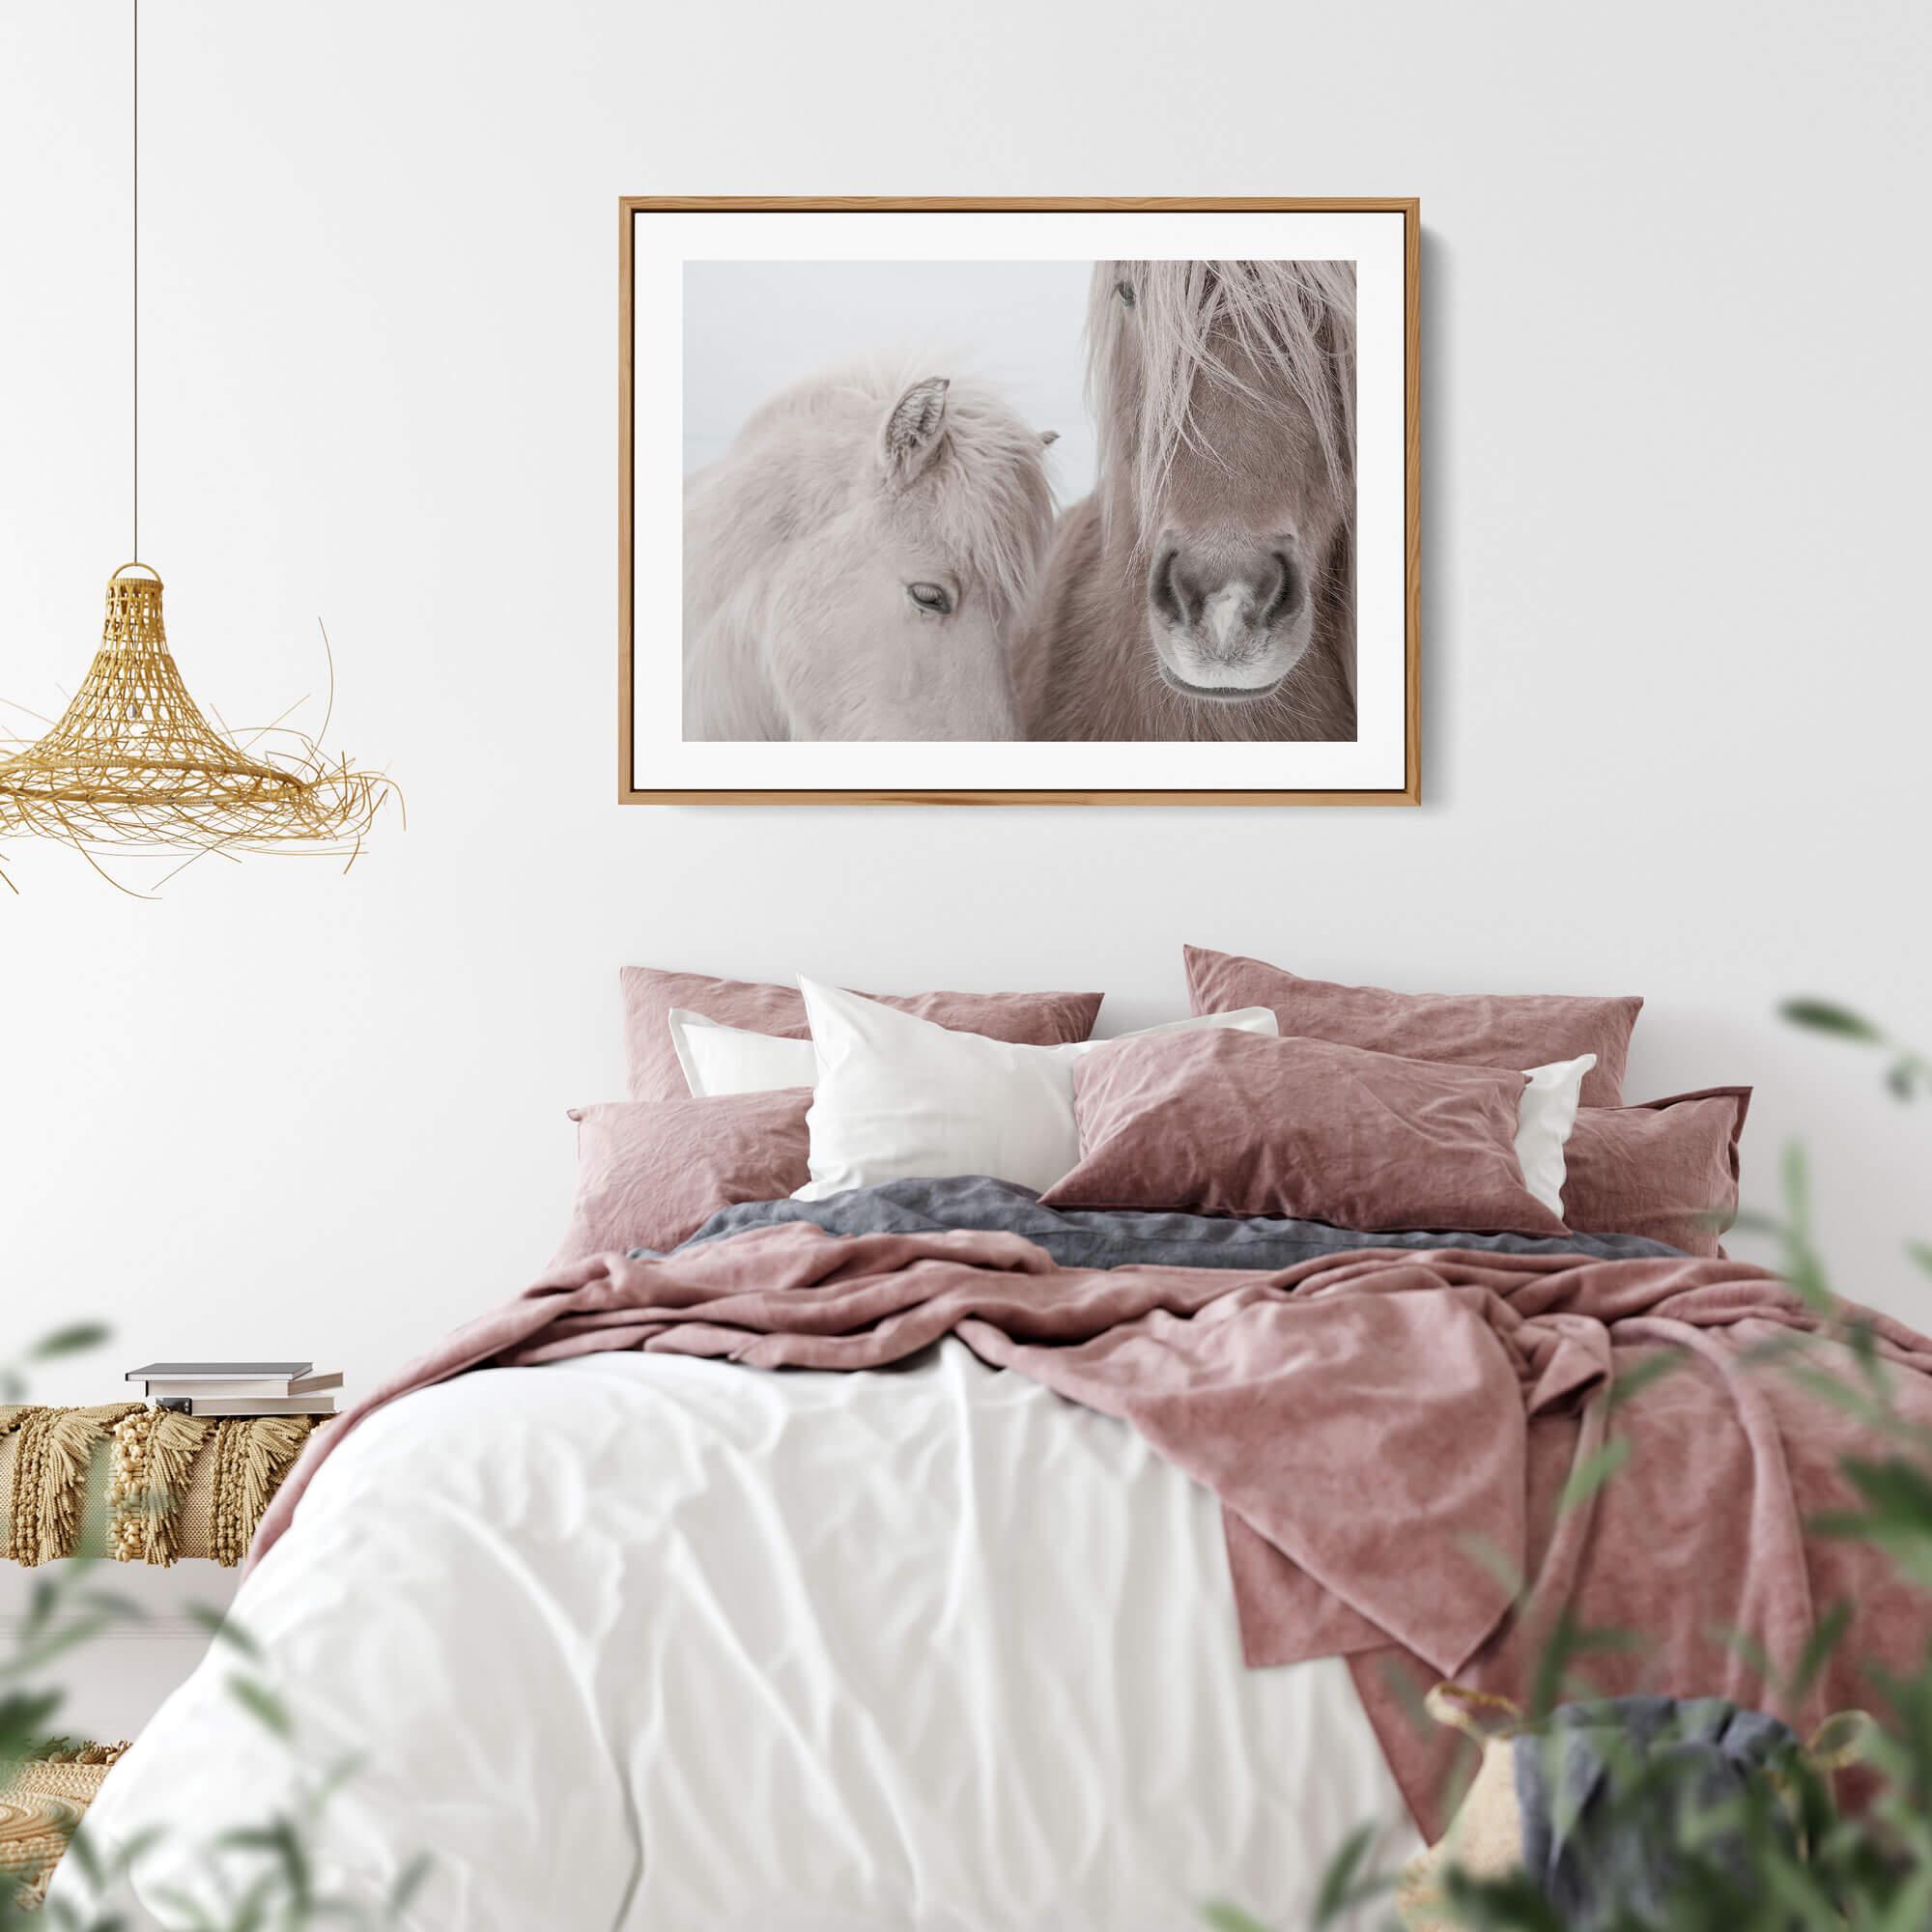 Two Horses art print 0144